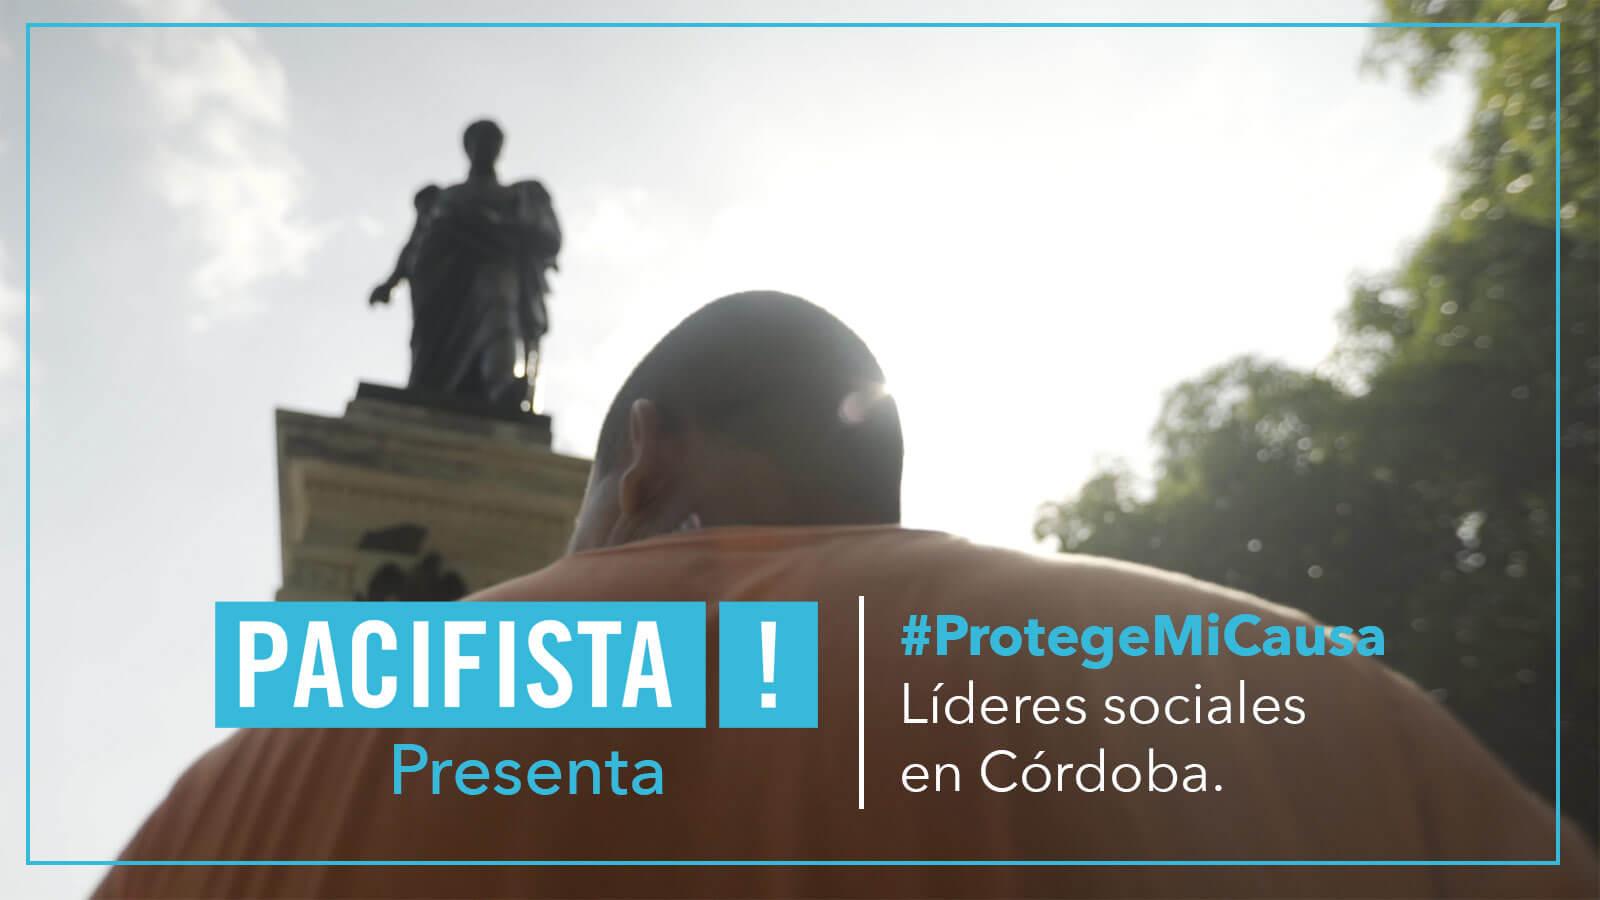 ¡Pacifista! Presenta: #ProtegeMiCausa Líderes sociales en Córdoba